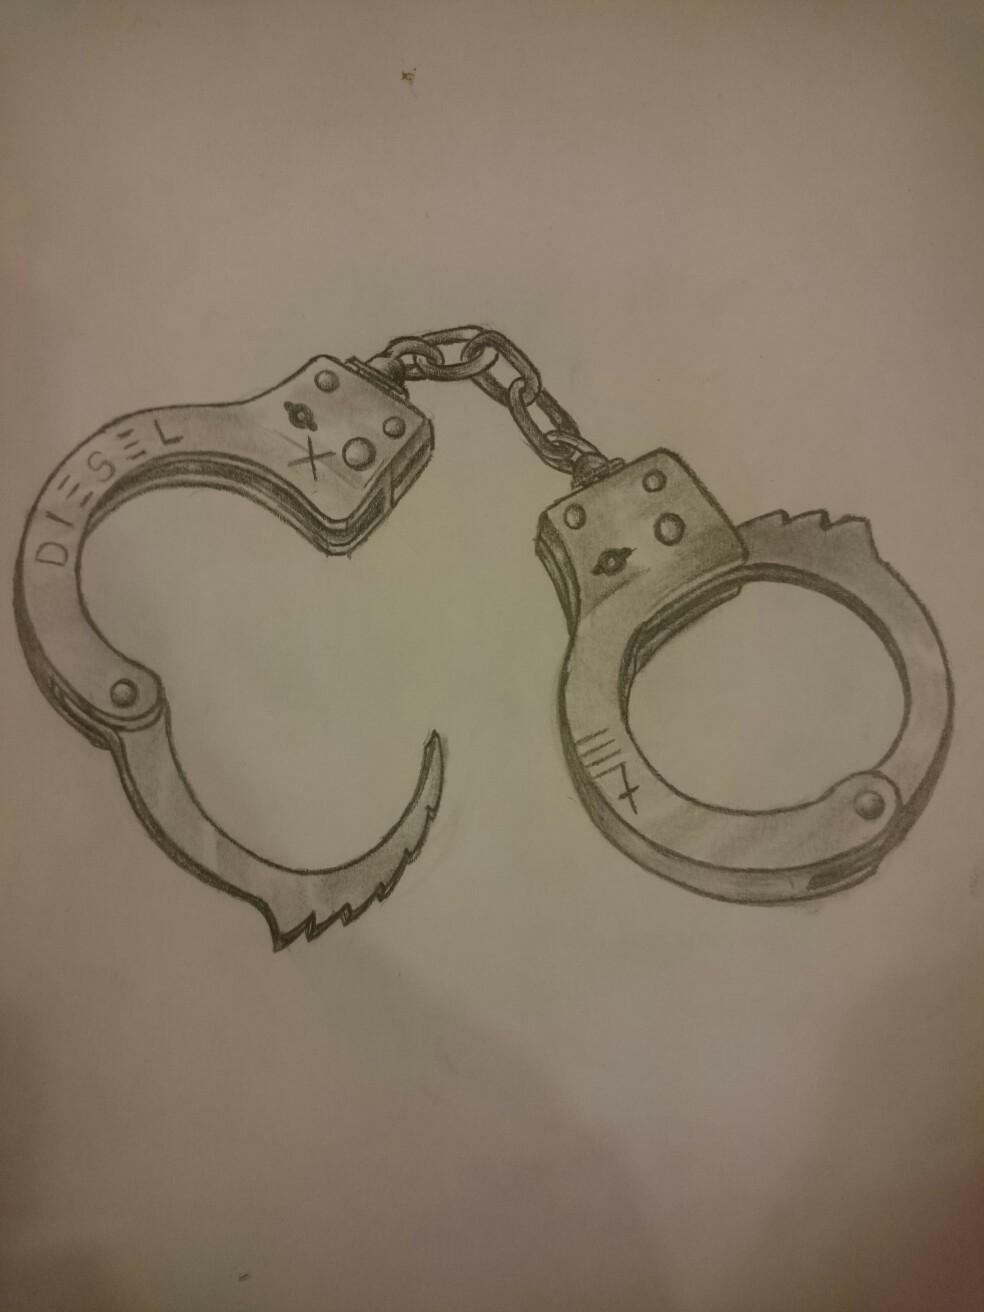 984x1312 Drawing handcuffs